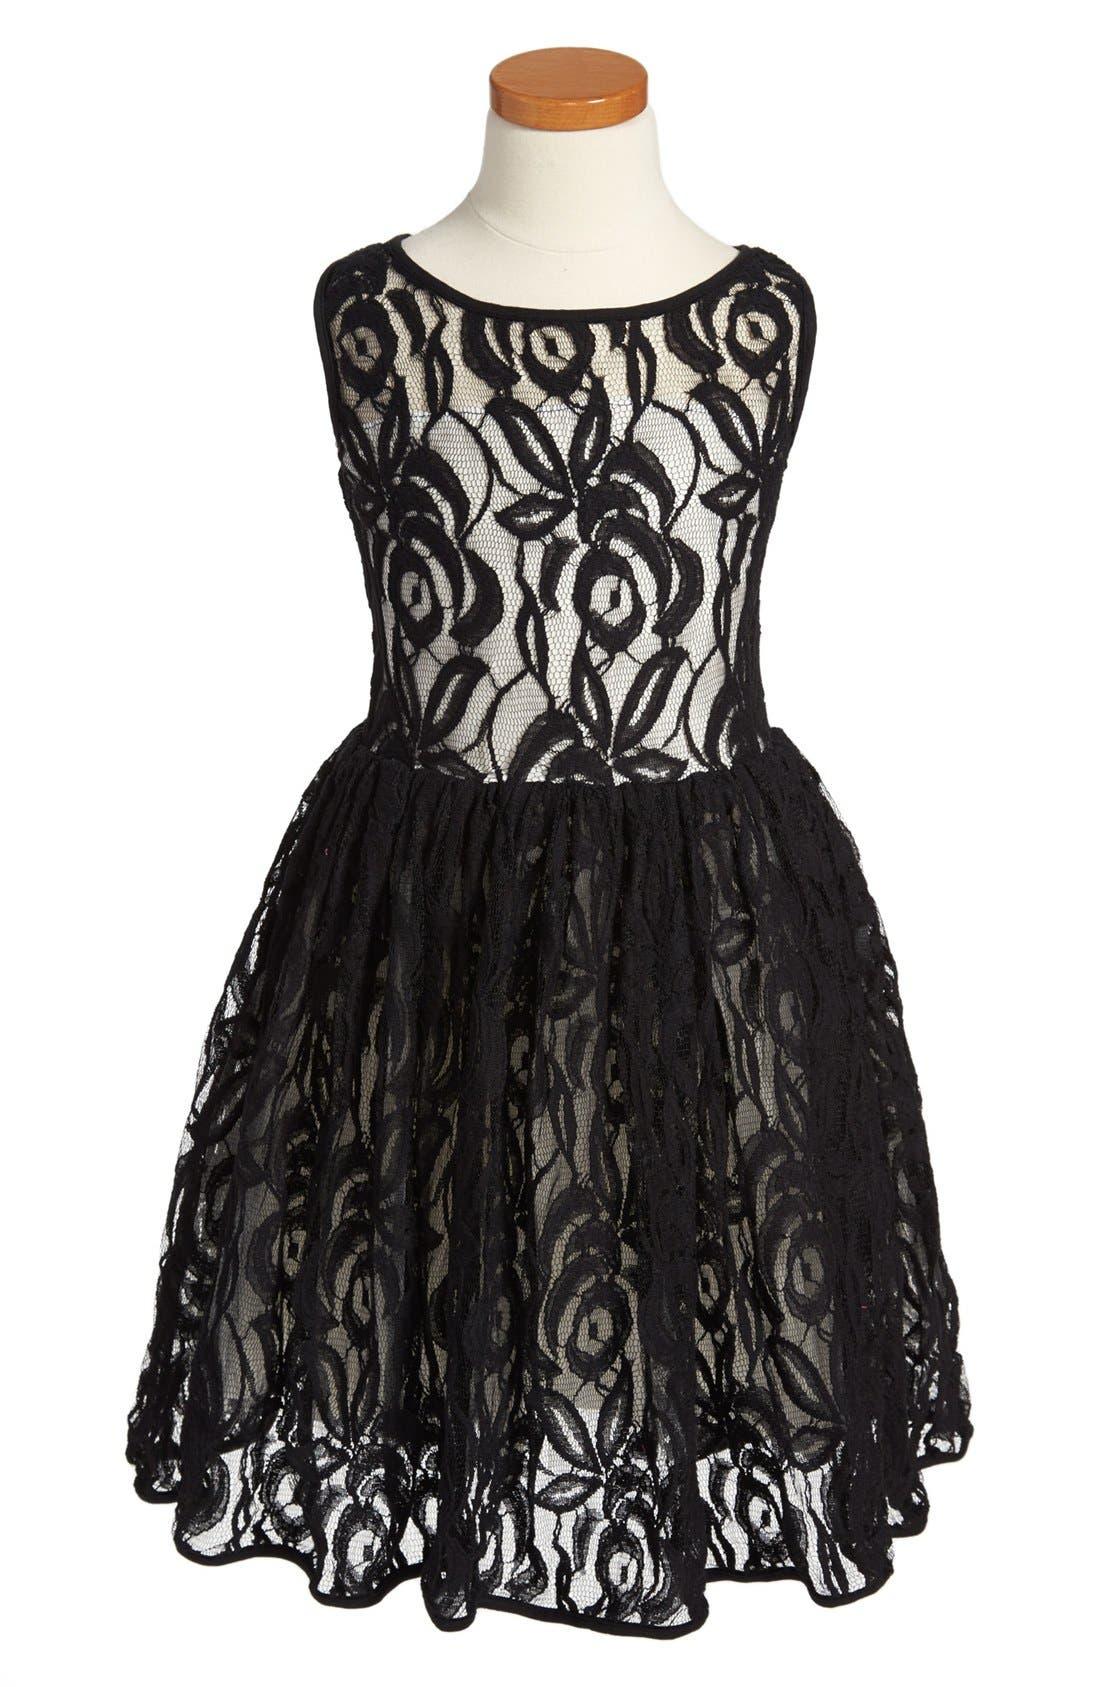 Main Image - Fiveloaves Twofish 'Mozart' Sleeveless Lace Dress (Little Girls & Big Girls)